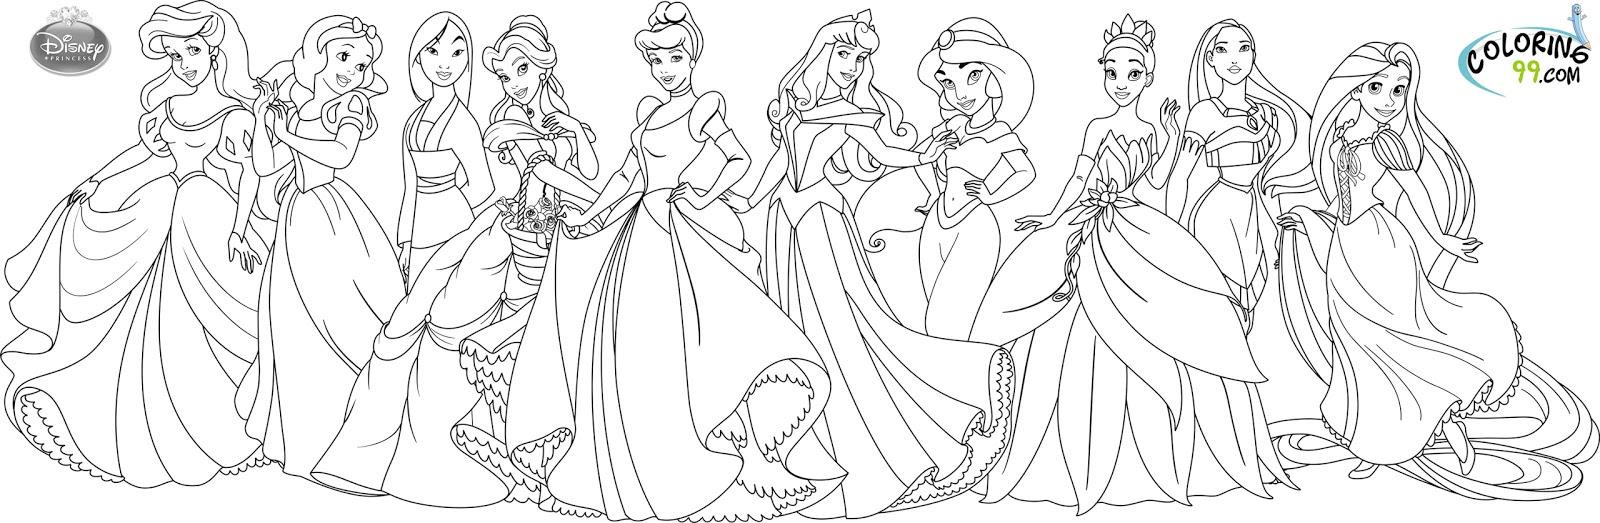 disney princess coloring sheets disney princess mermaid coloring pages princess coloring sheets disney